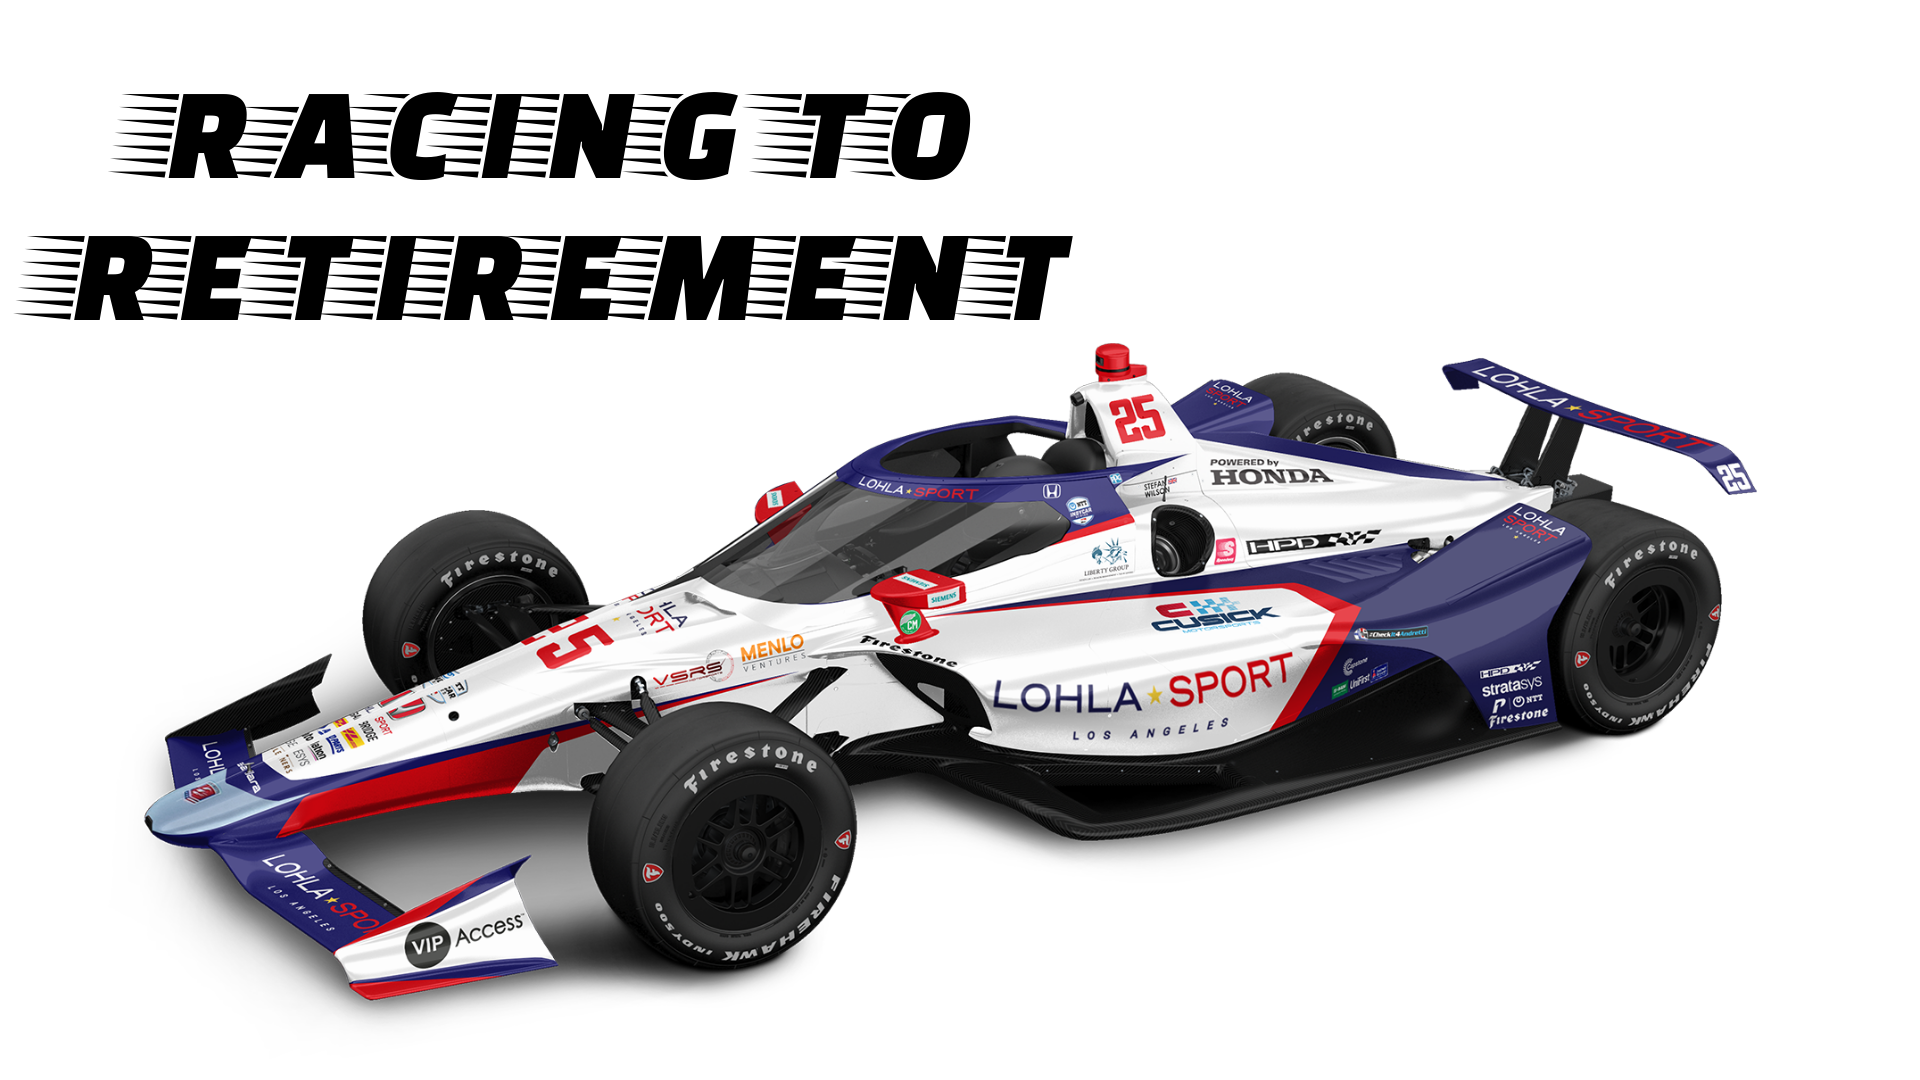 Racing to Retirement (1)